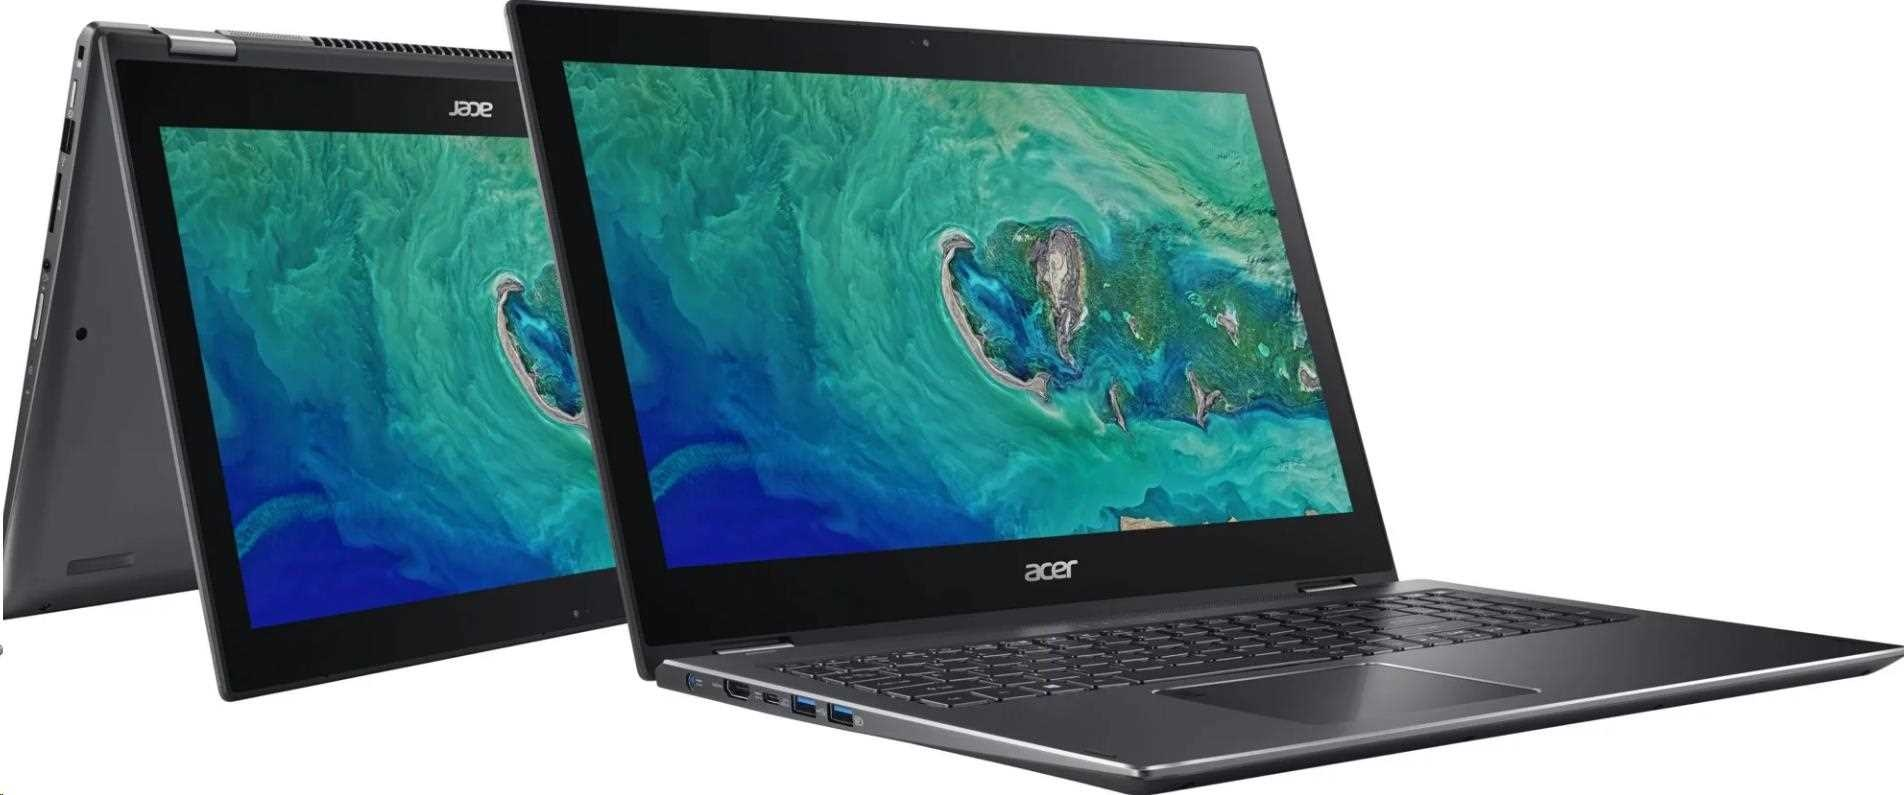 "ACER NTB Spin 5 (SP515-51N-82GE) - i7-8550U@1.8GHz,15.6"" FHD IPS touch,8GB,1THDD54,Intel Optane,HD Graphics,backl,W10H"